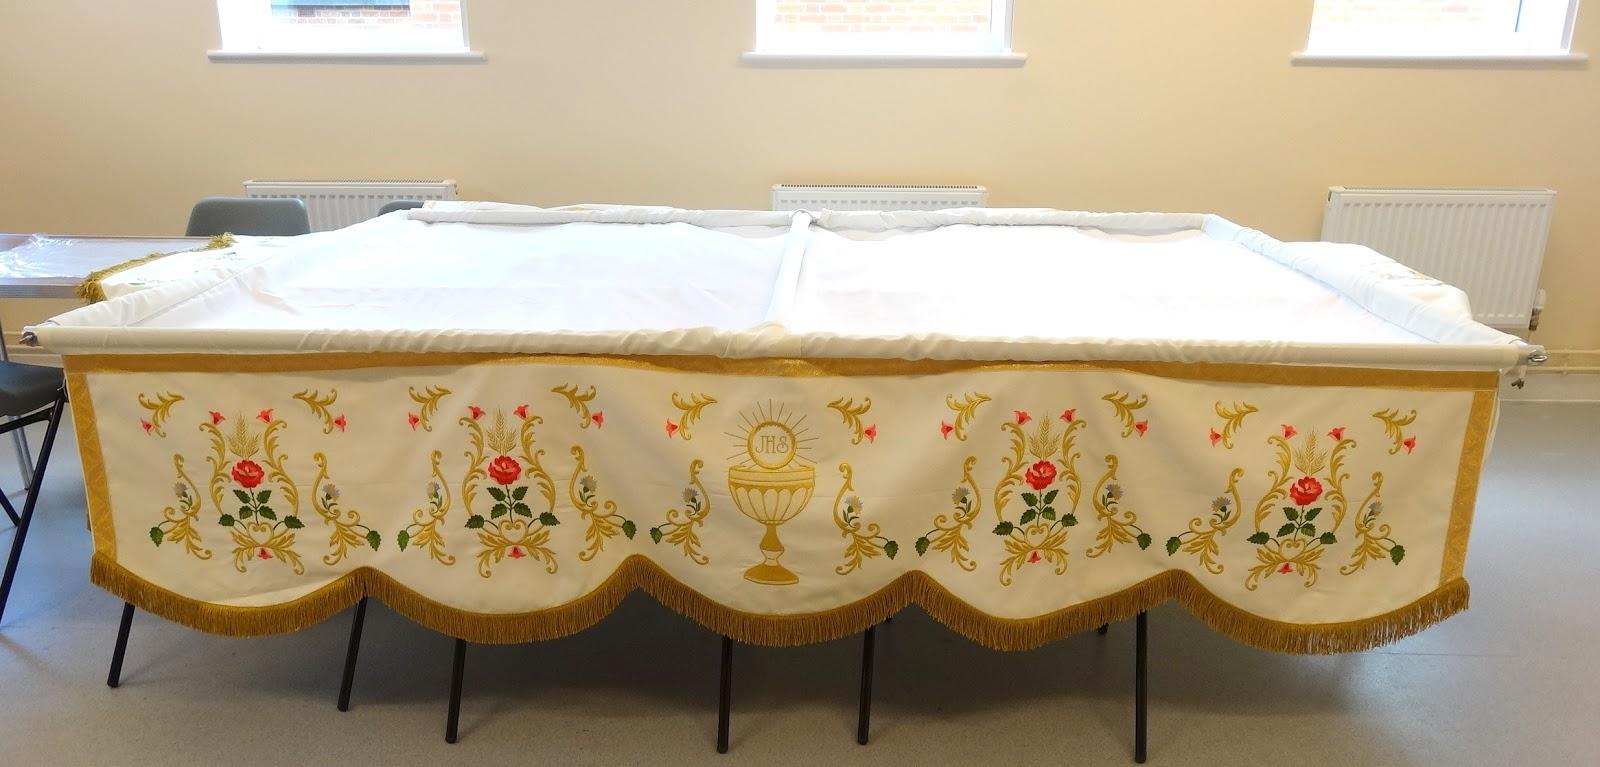 St Anns Parish Blog Banstead Corpus Christi And Our New Baldacchino